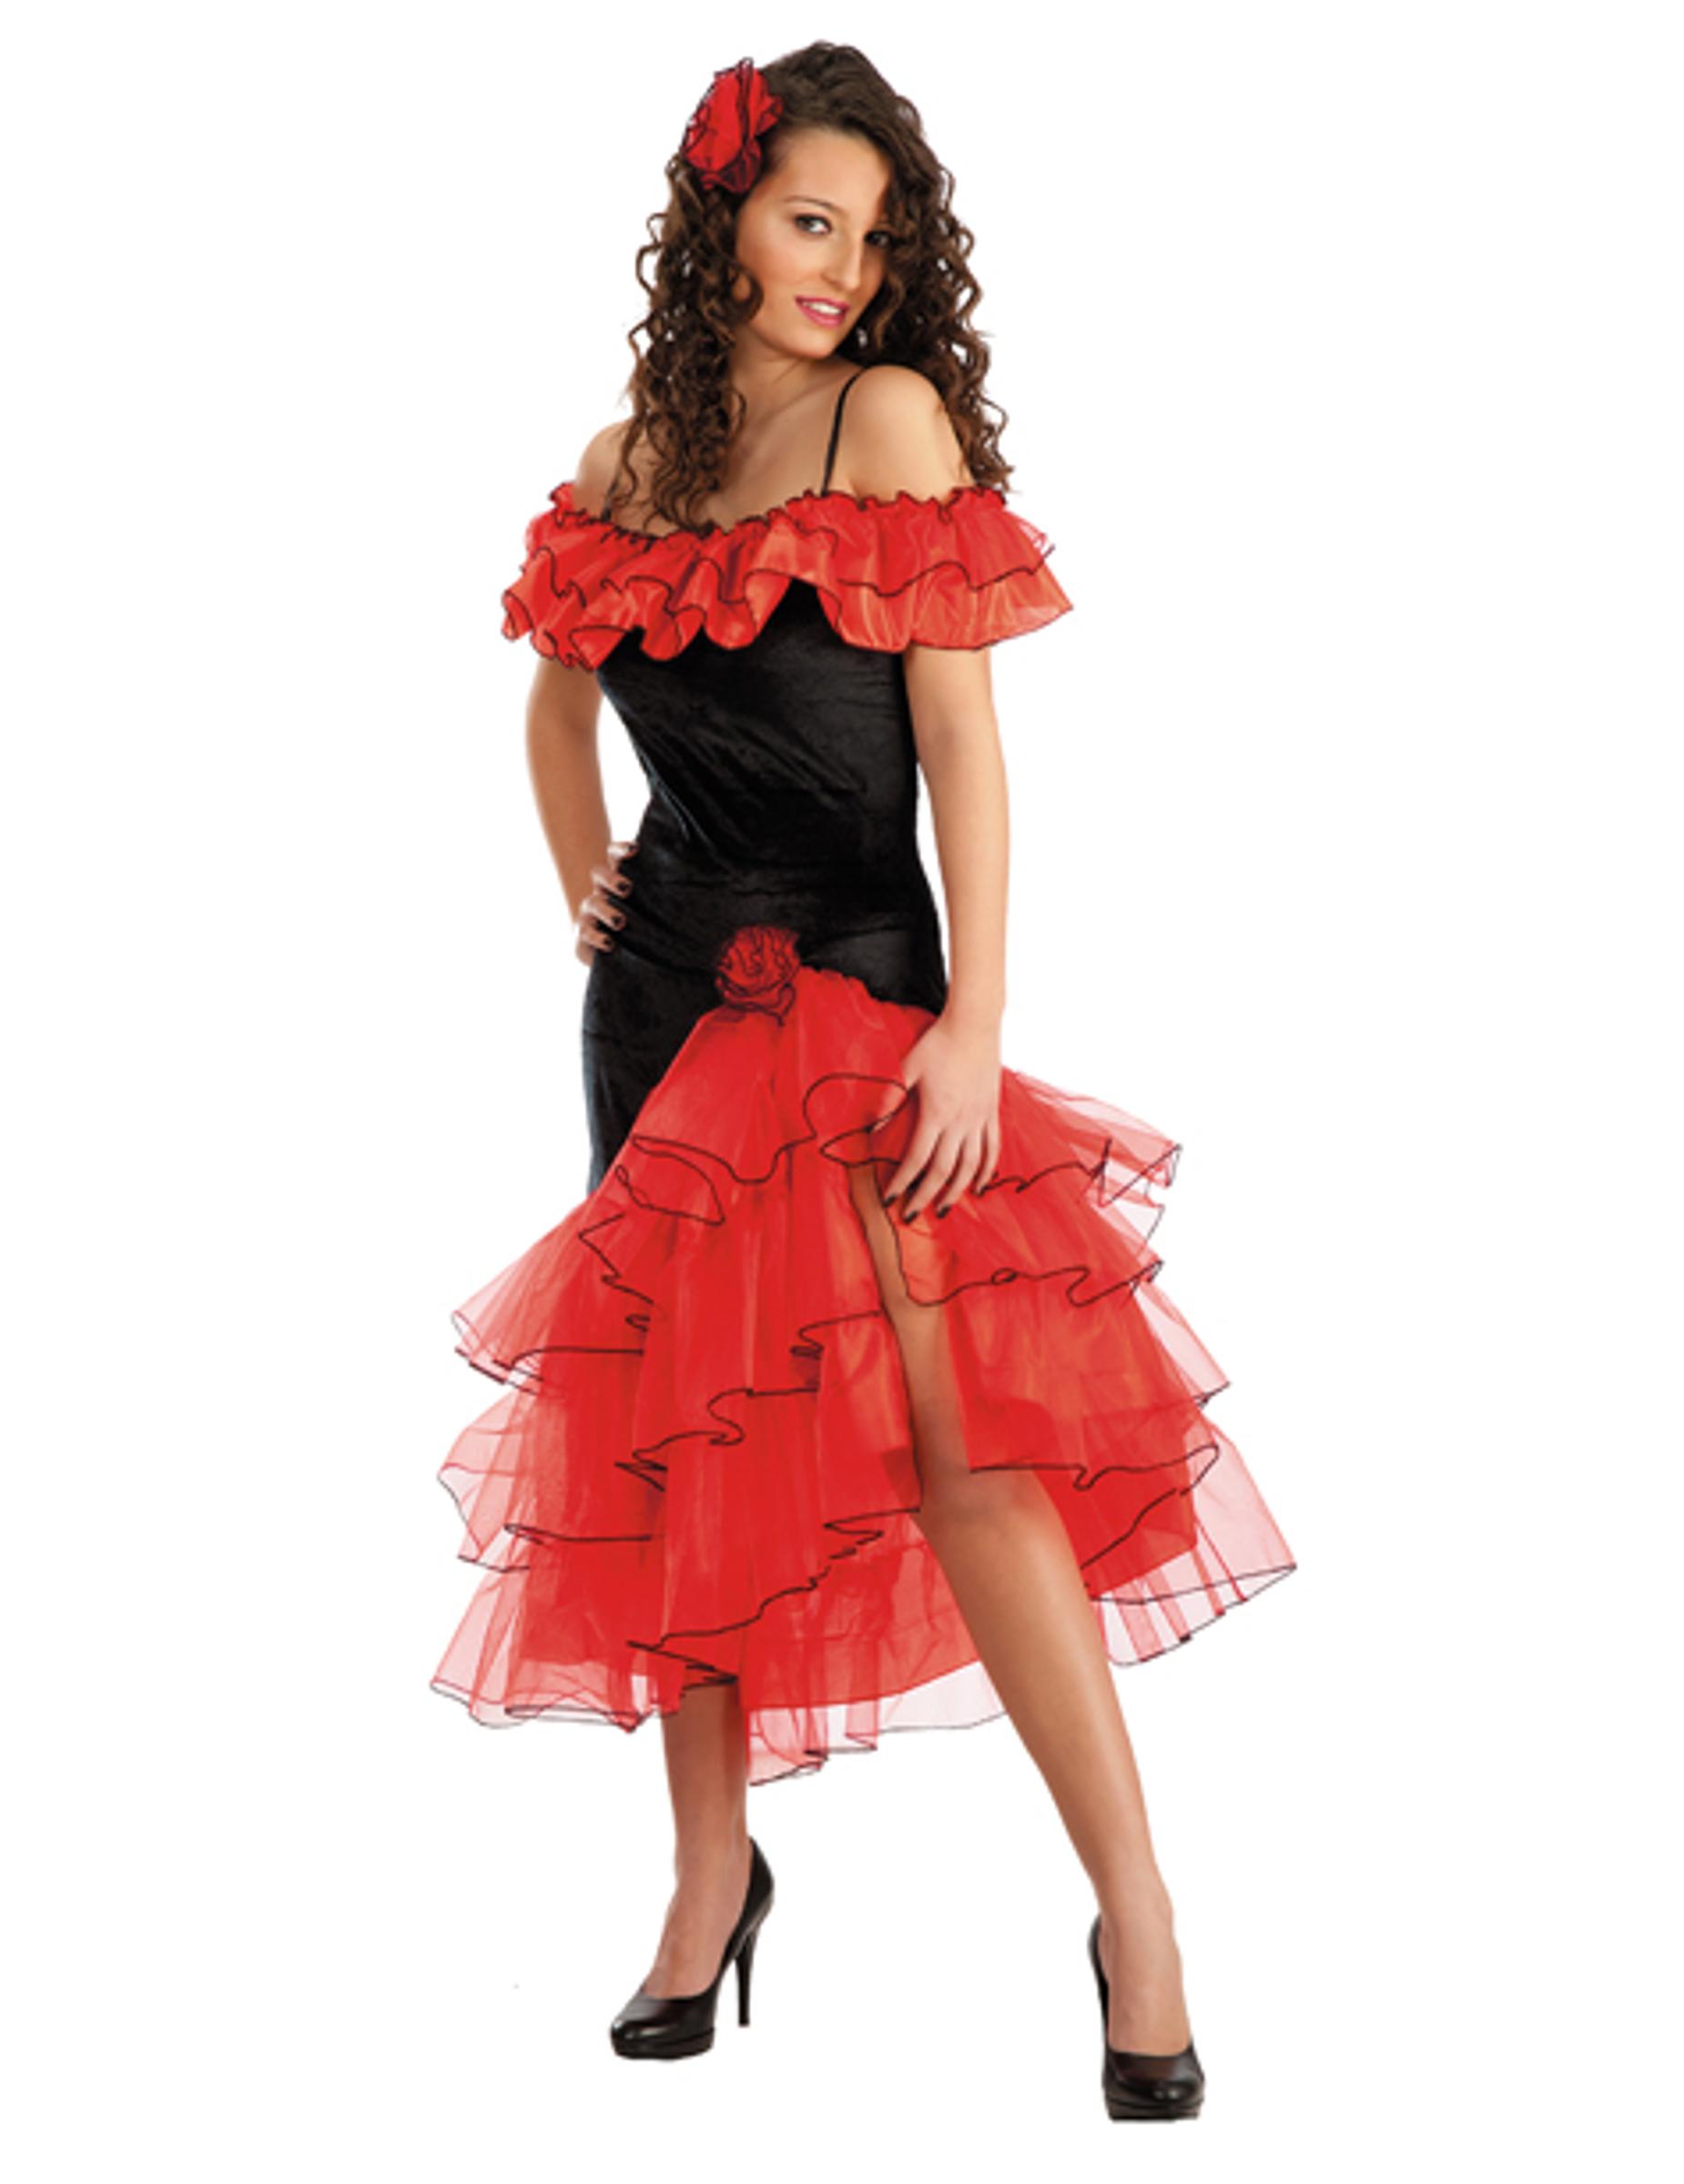 Damenkost m spanische t nzerin g nstige faschings kost me bei karneval megastore - Spanische tischdekoration ...